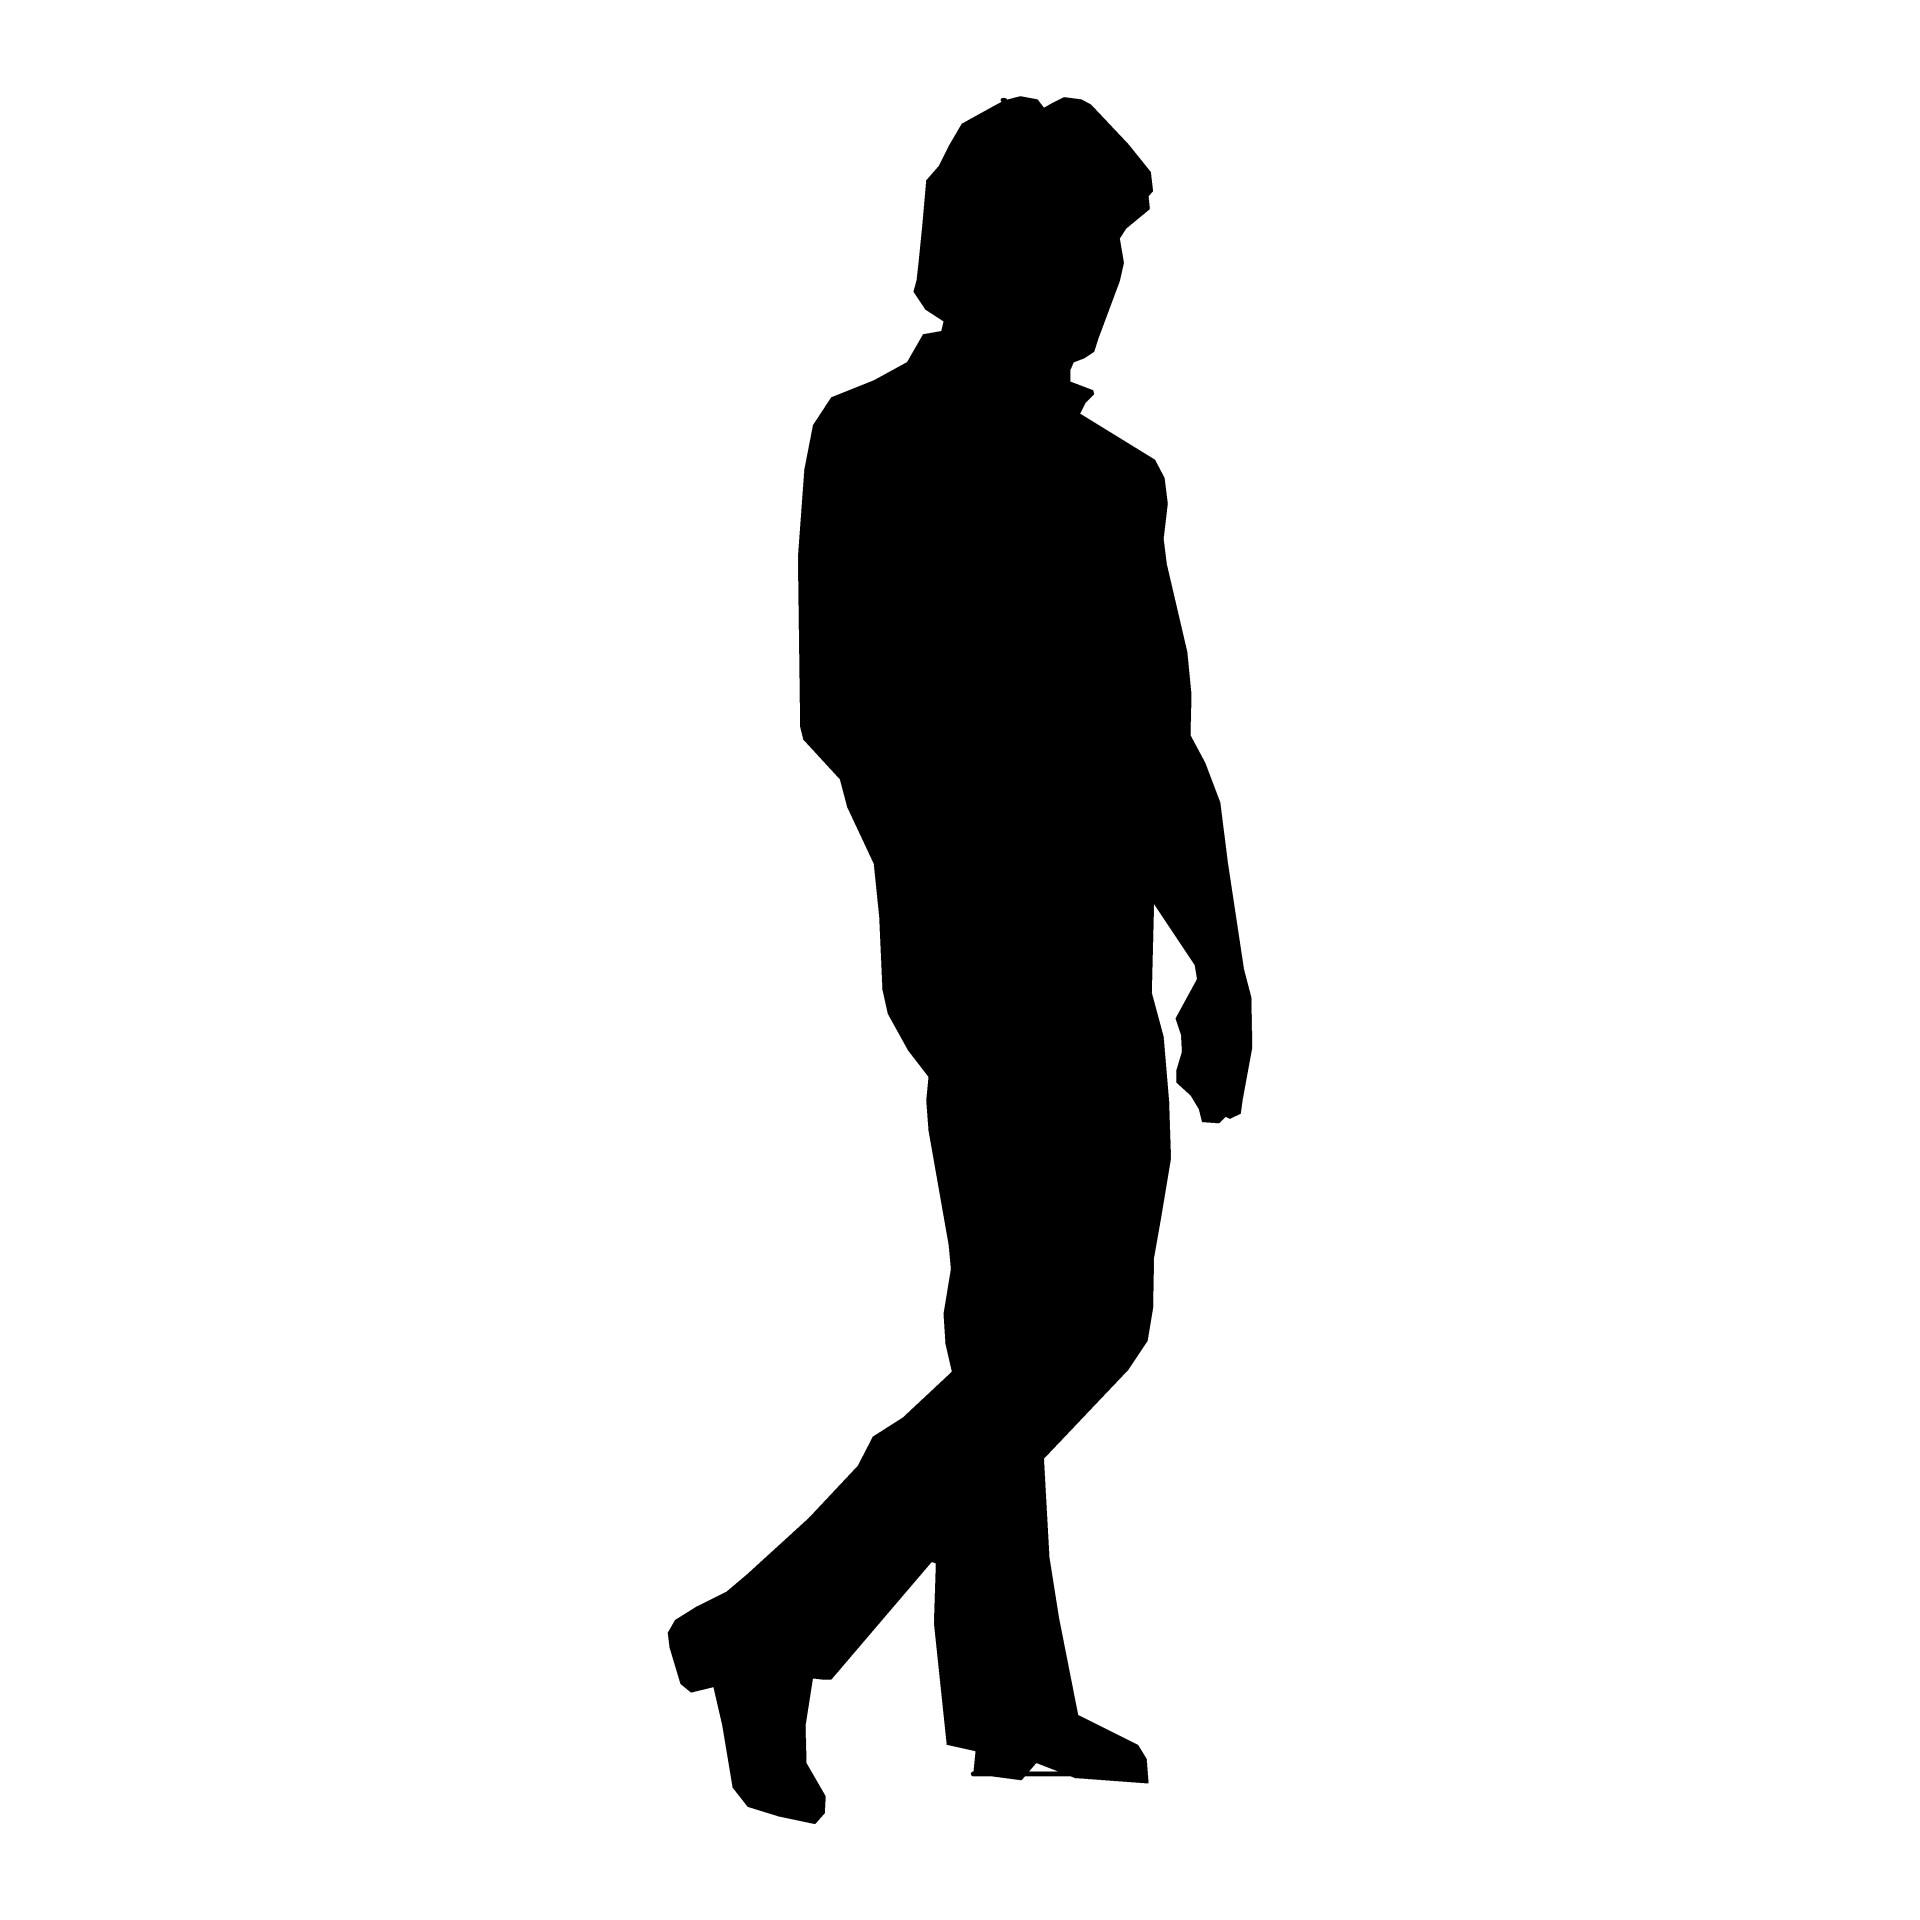 1920x1920 Silhouette Man Walking Free Stock Photo